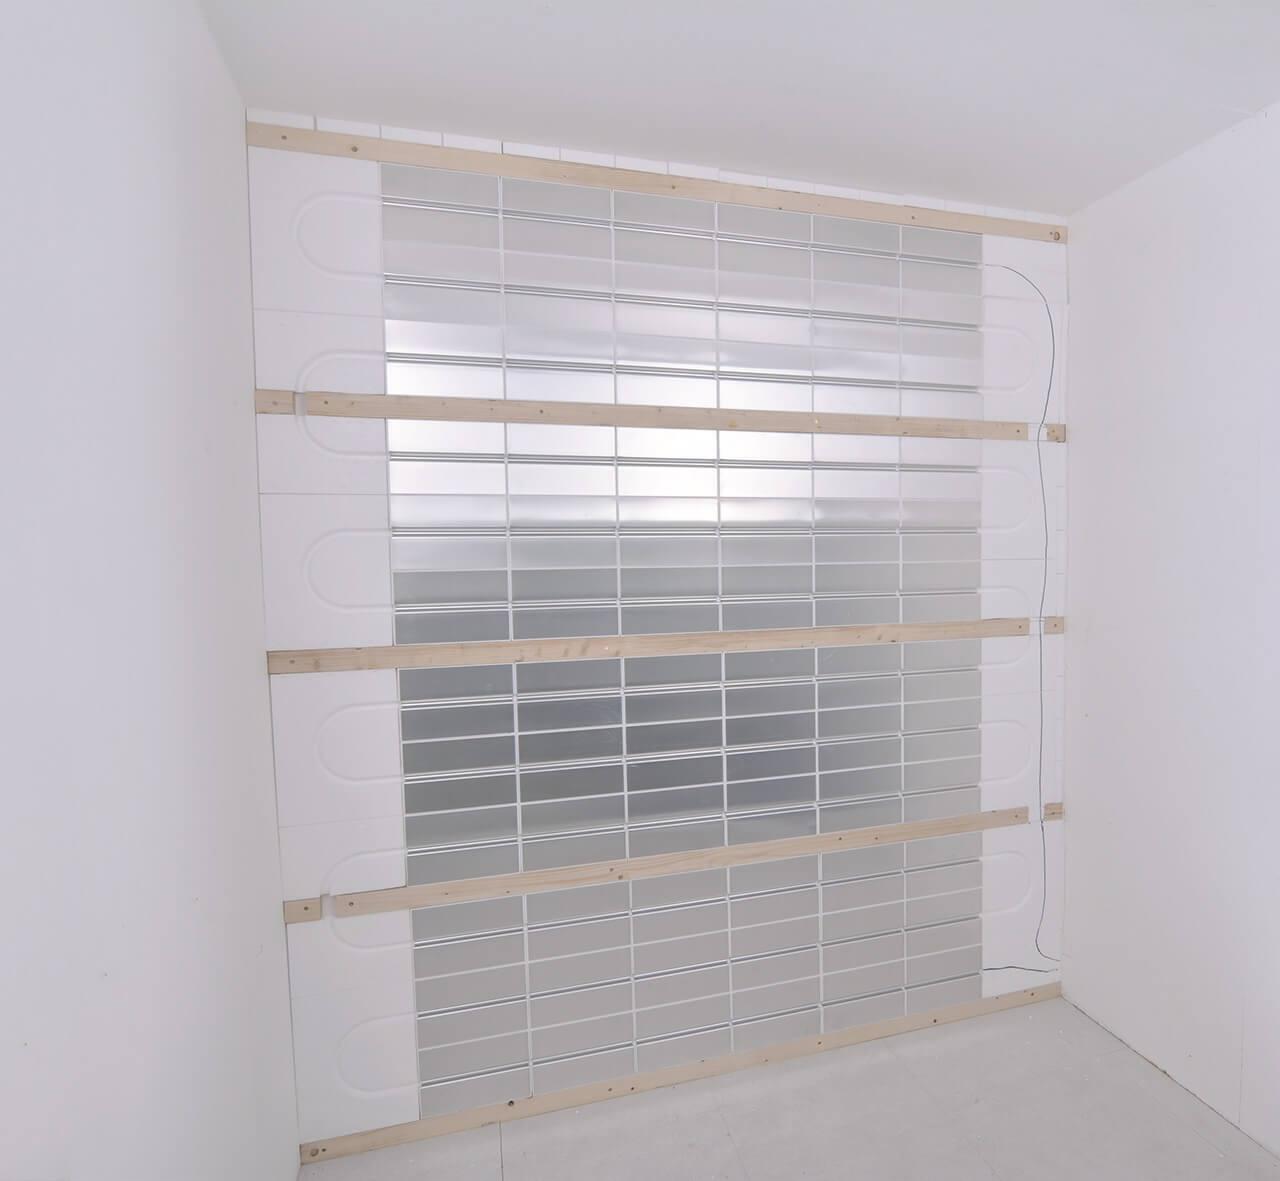 wandheizung trockenbau sparset 5 100 m quicktherm. Black Bedroom Furniture Sets. Home Design Ideas